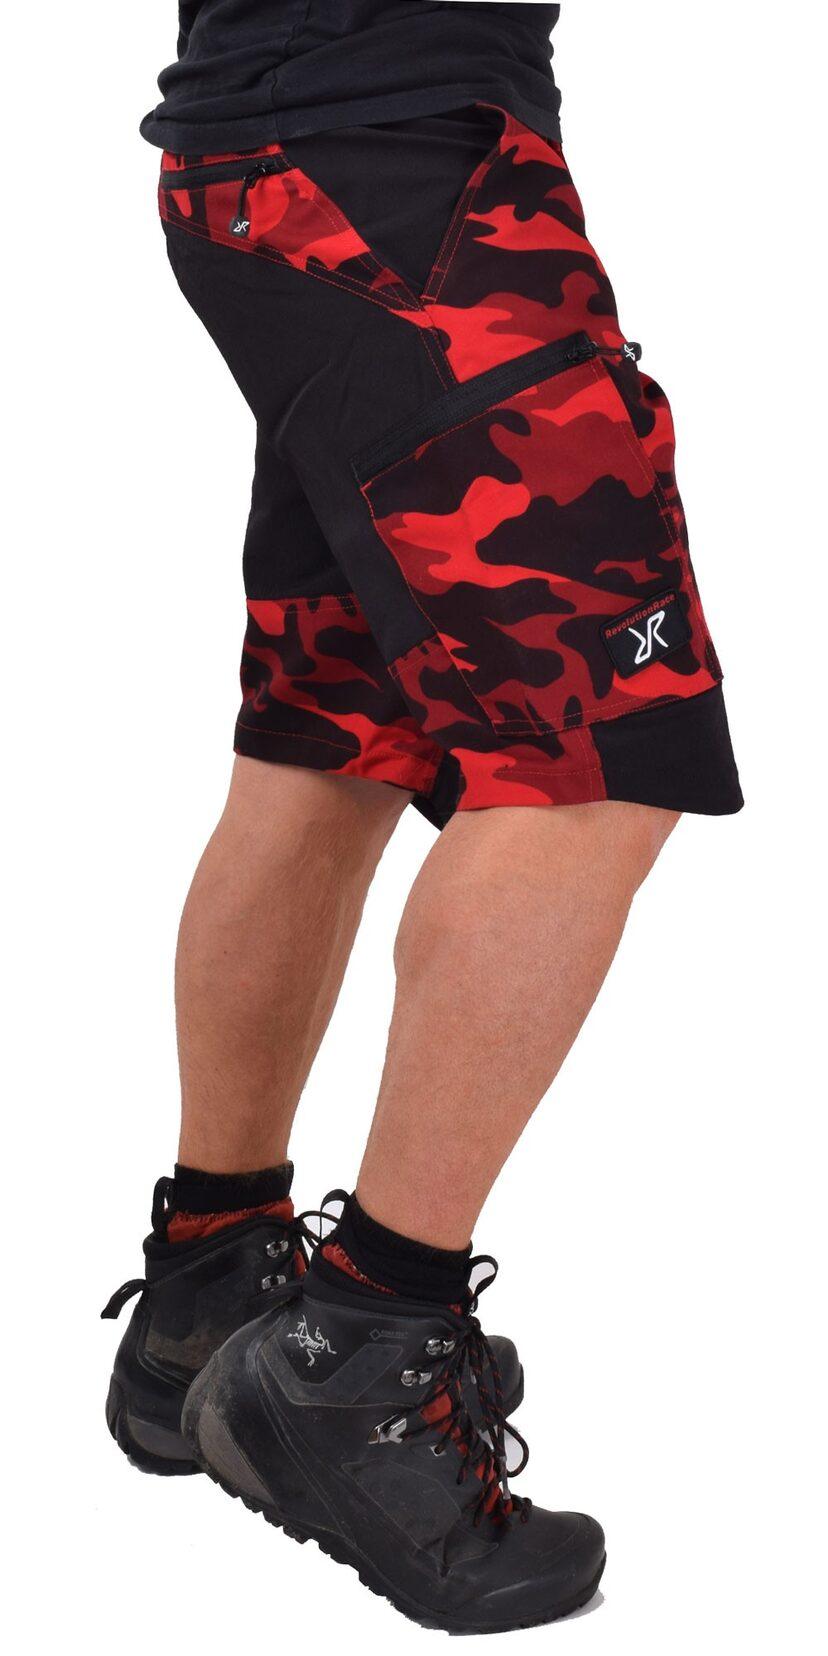 Nordwand Shorts Butcher Camo Men